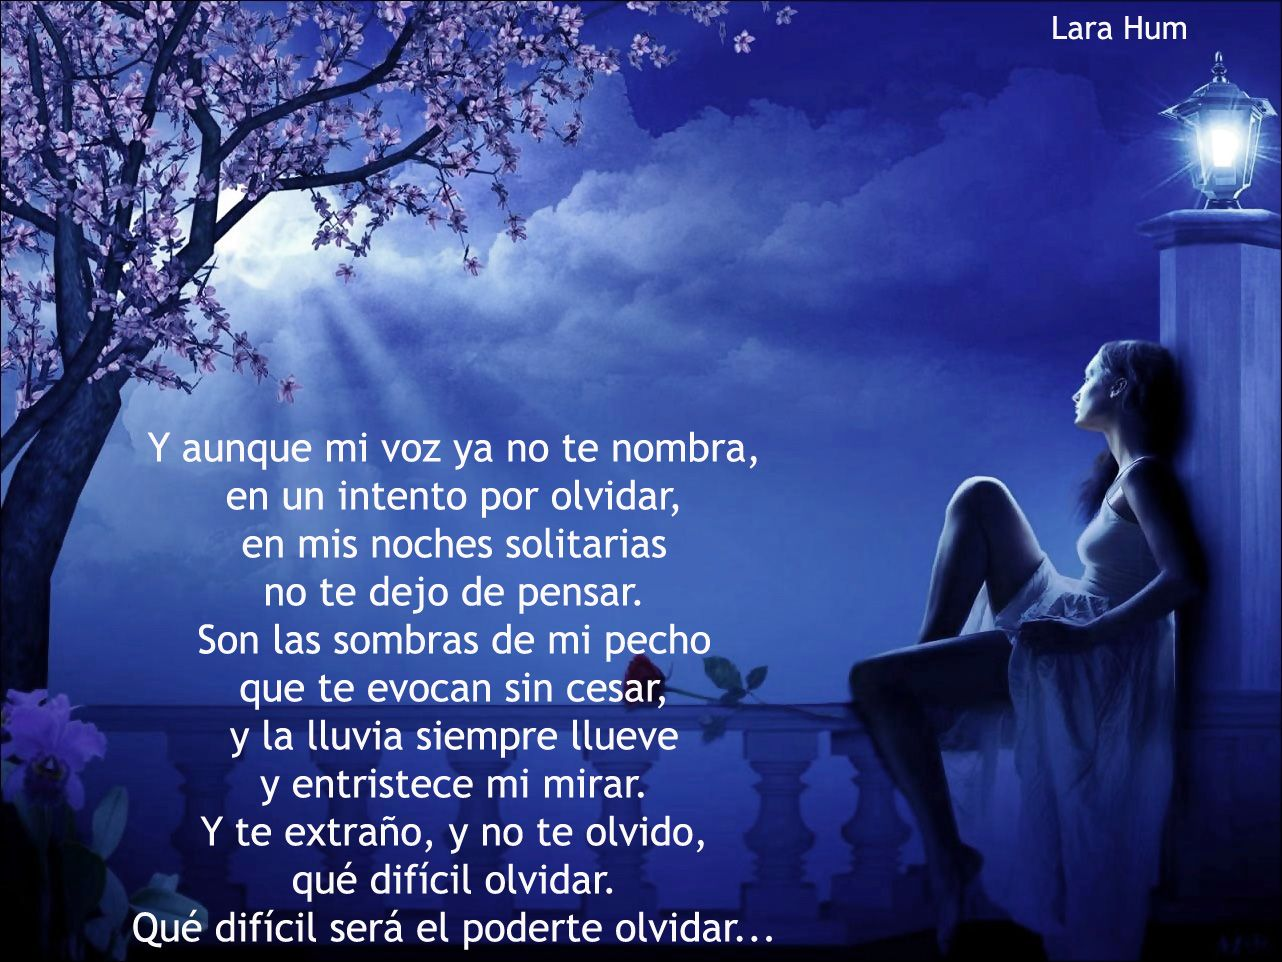 Lara Hum